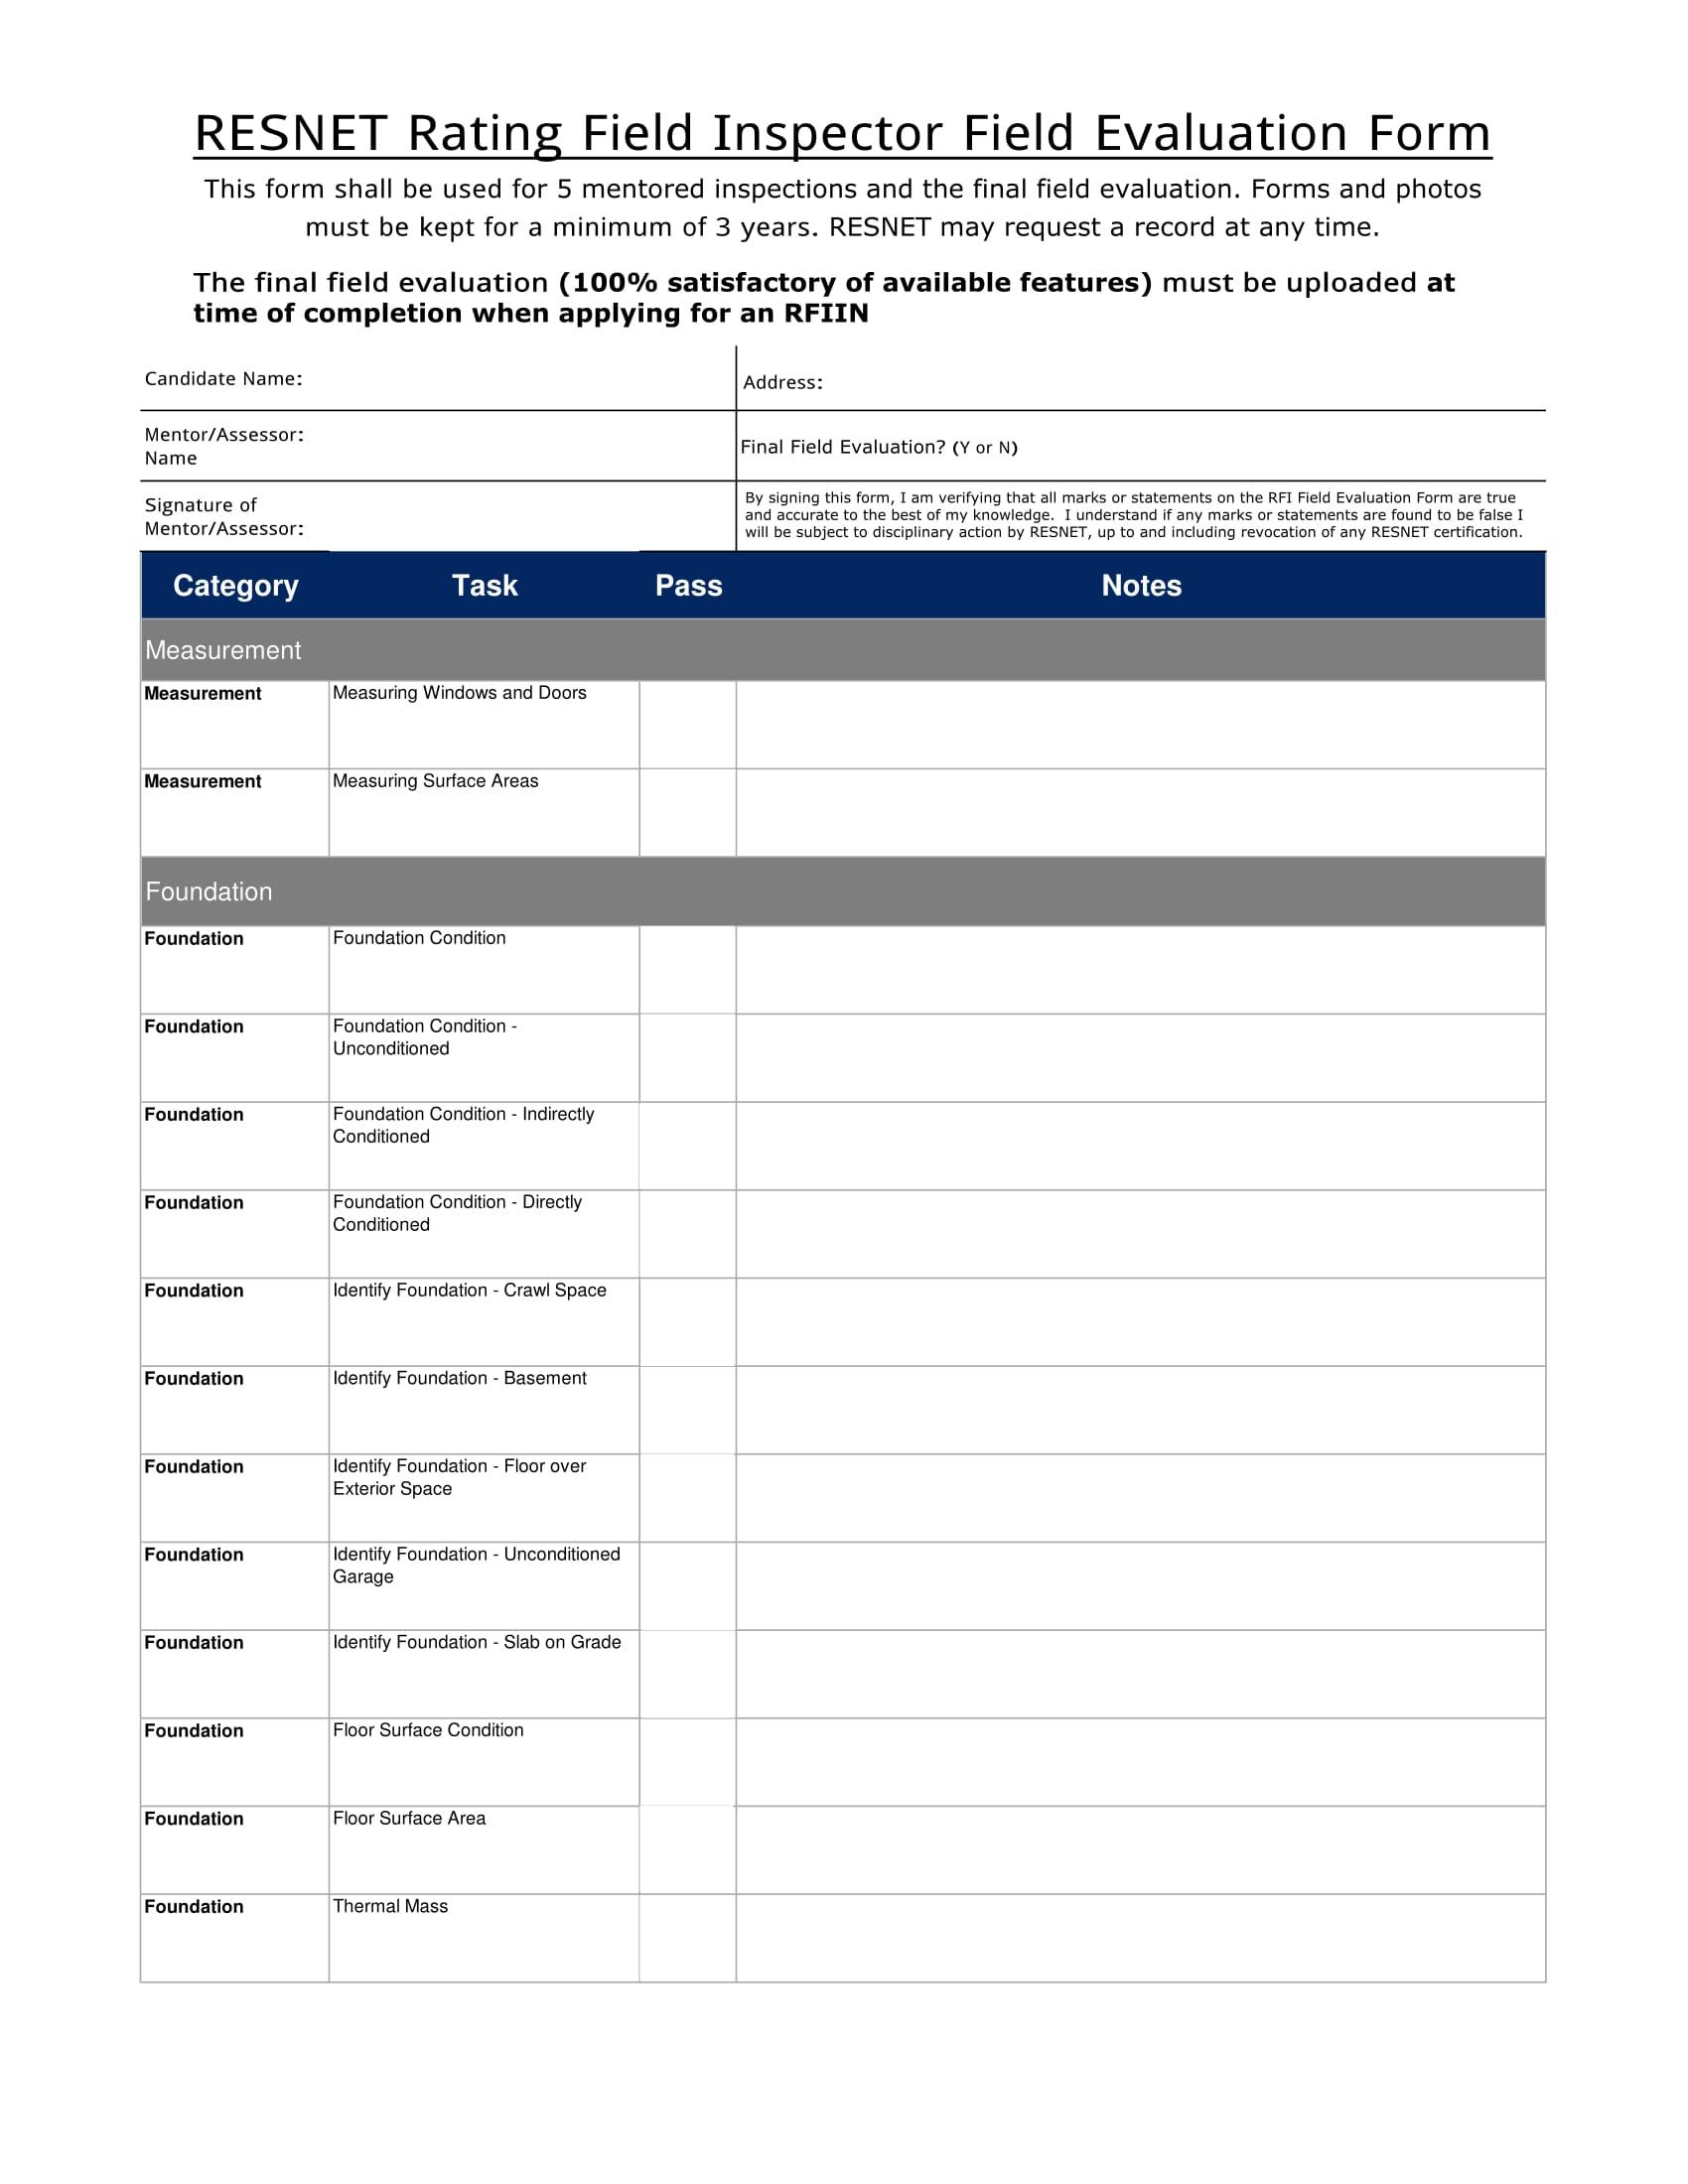 field inspector field evaluation form 1